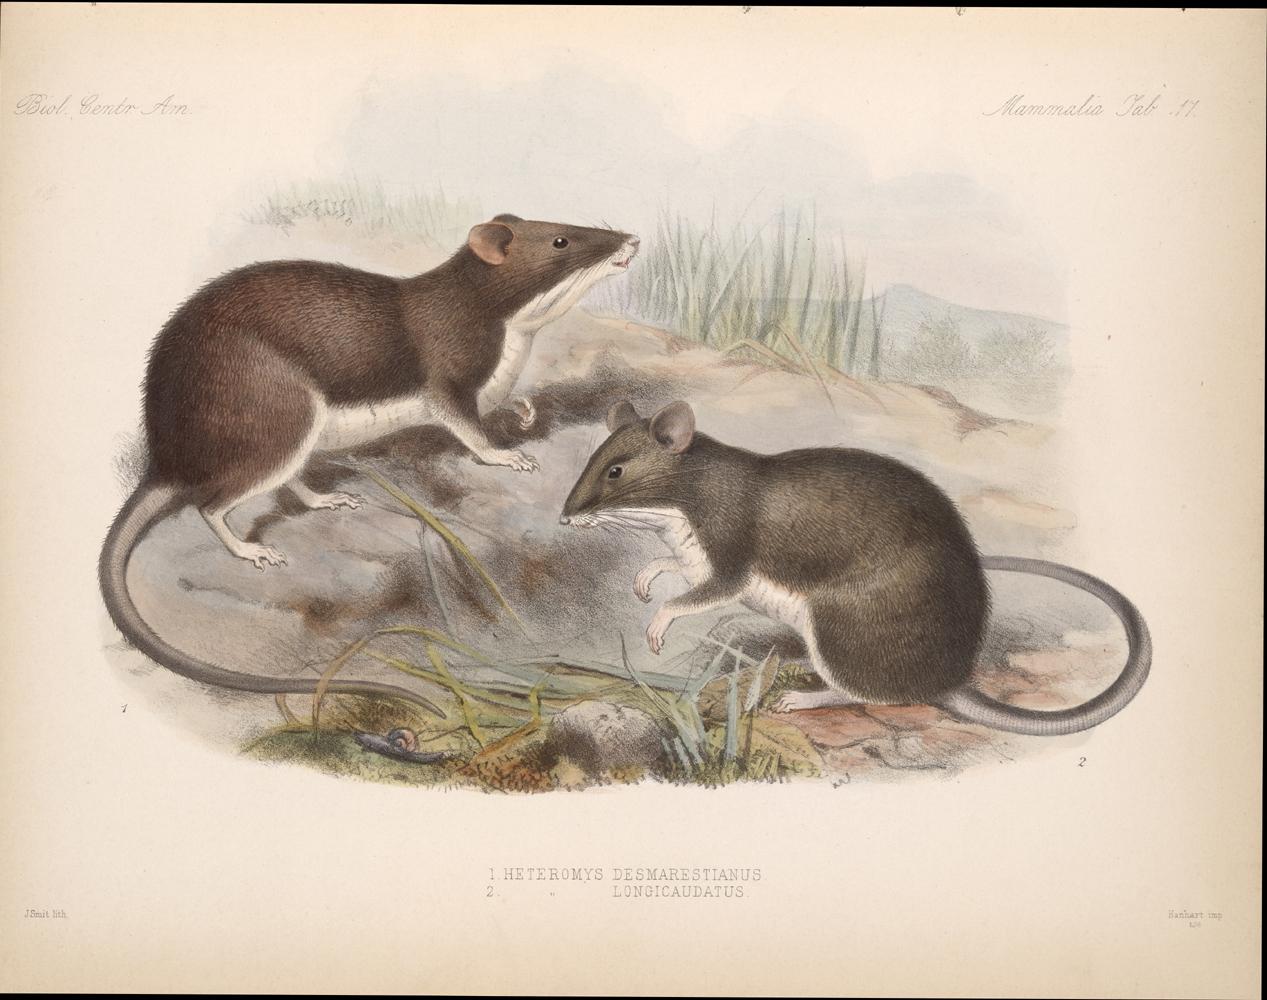 Mammals,  Image number:bca_02_00_00_281